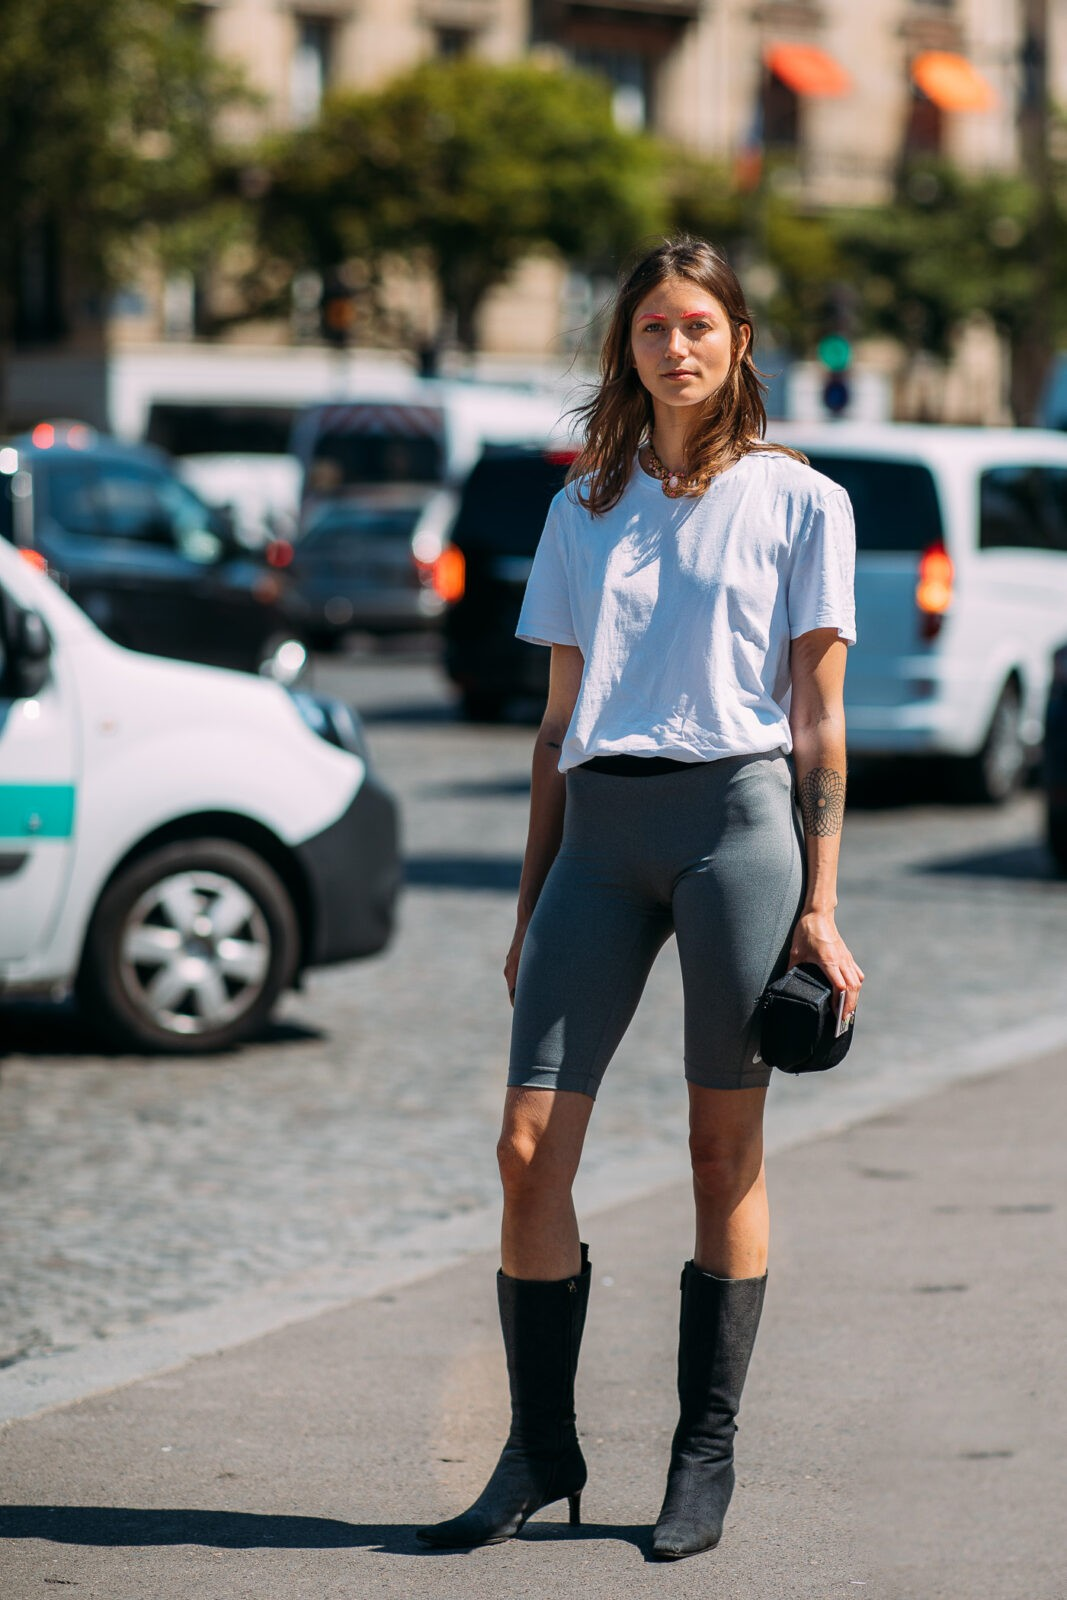 Vanille Verloes stylebook biker short trend edit seven